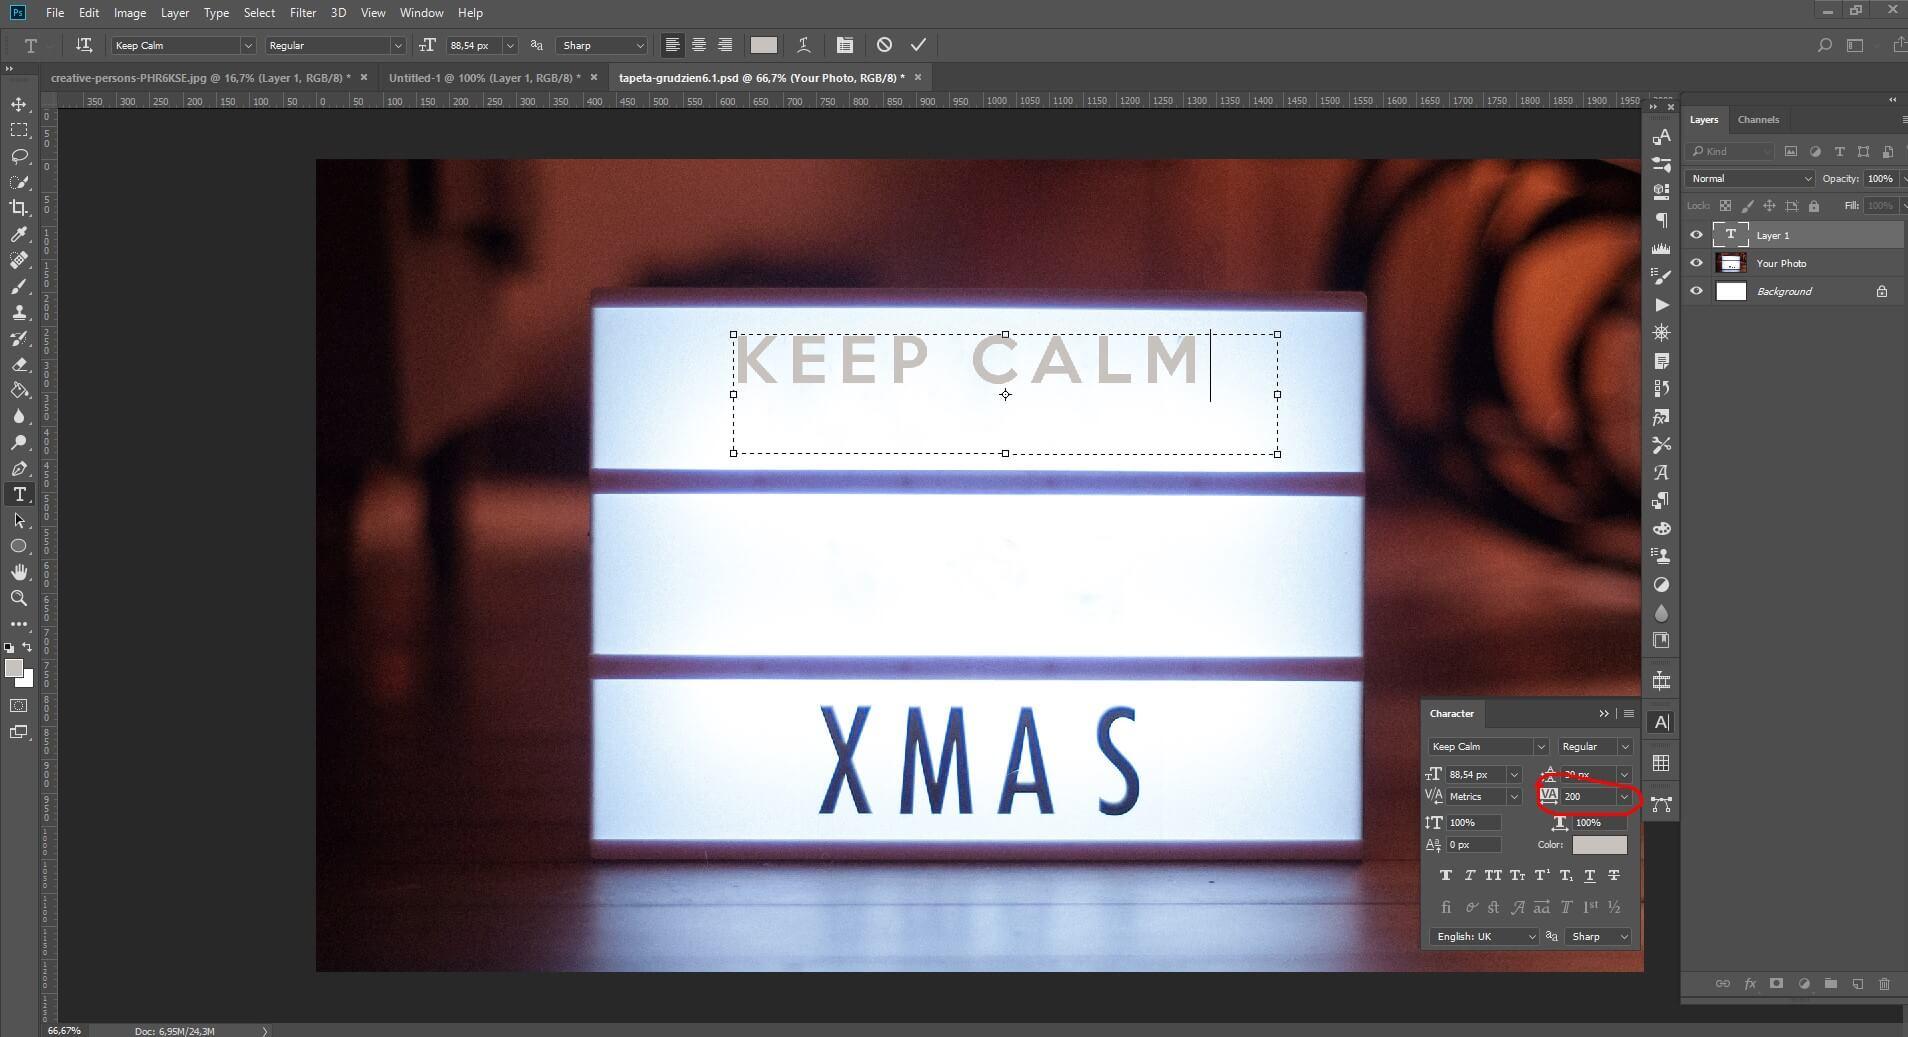 Photoshop usunięcie elementu - dodawanie tekstu